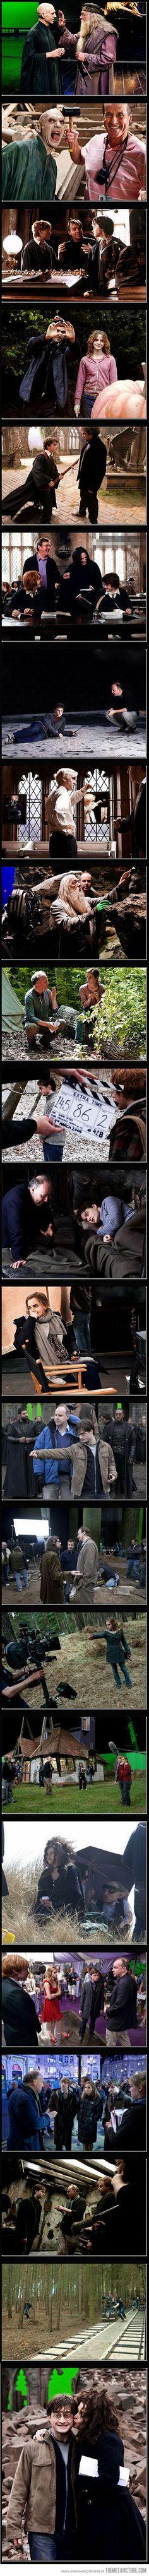 Harry behind the scenes